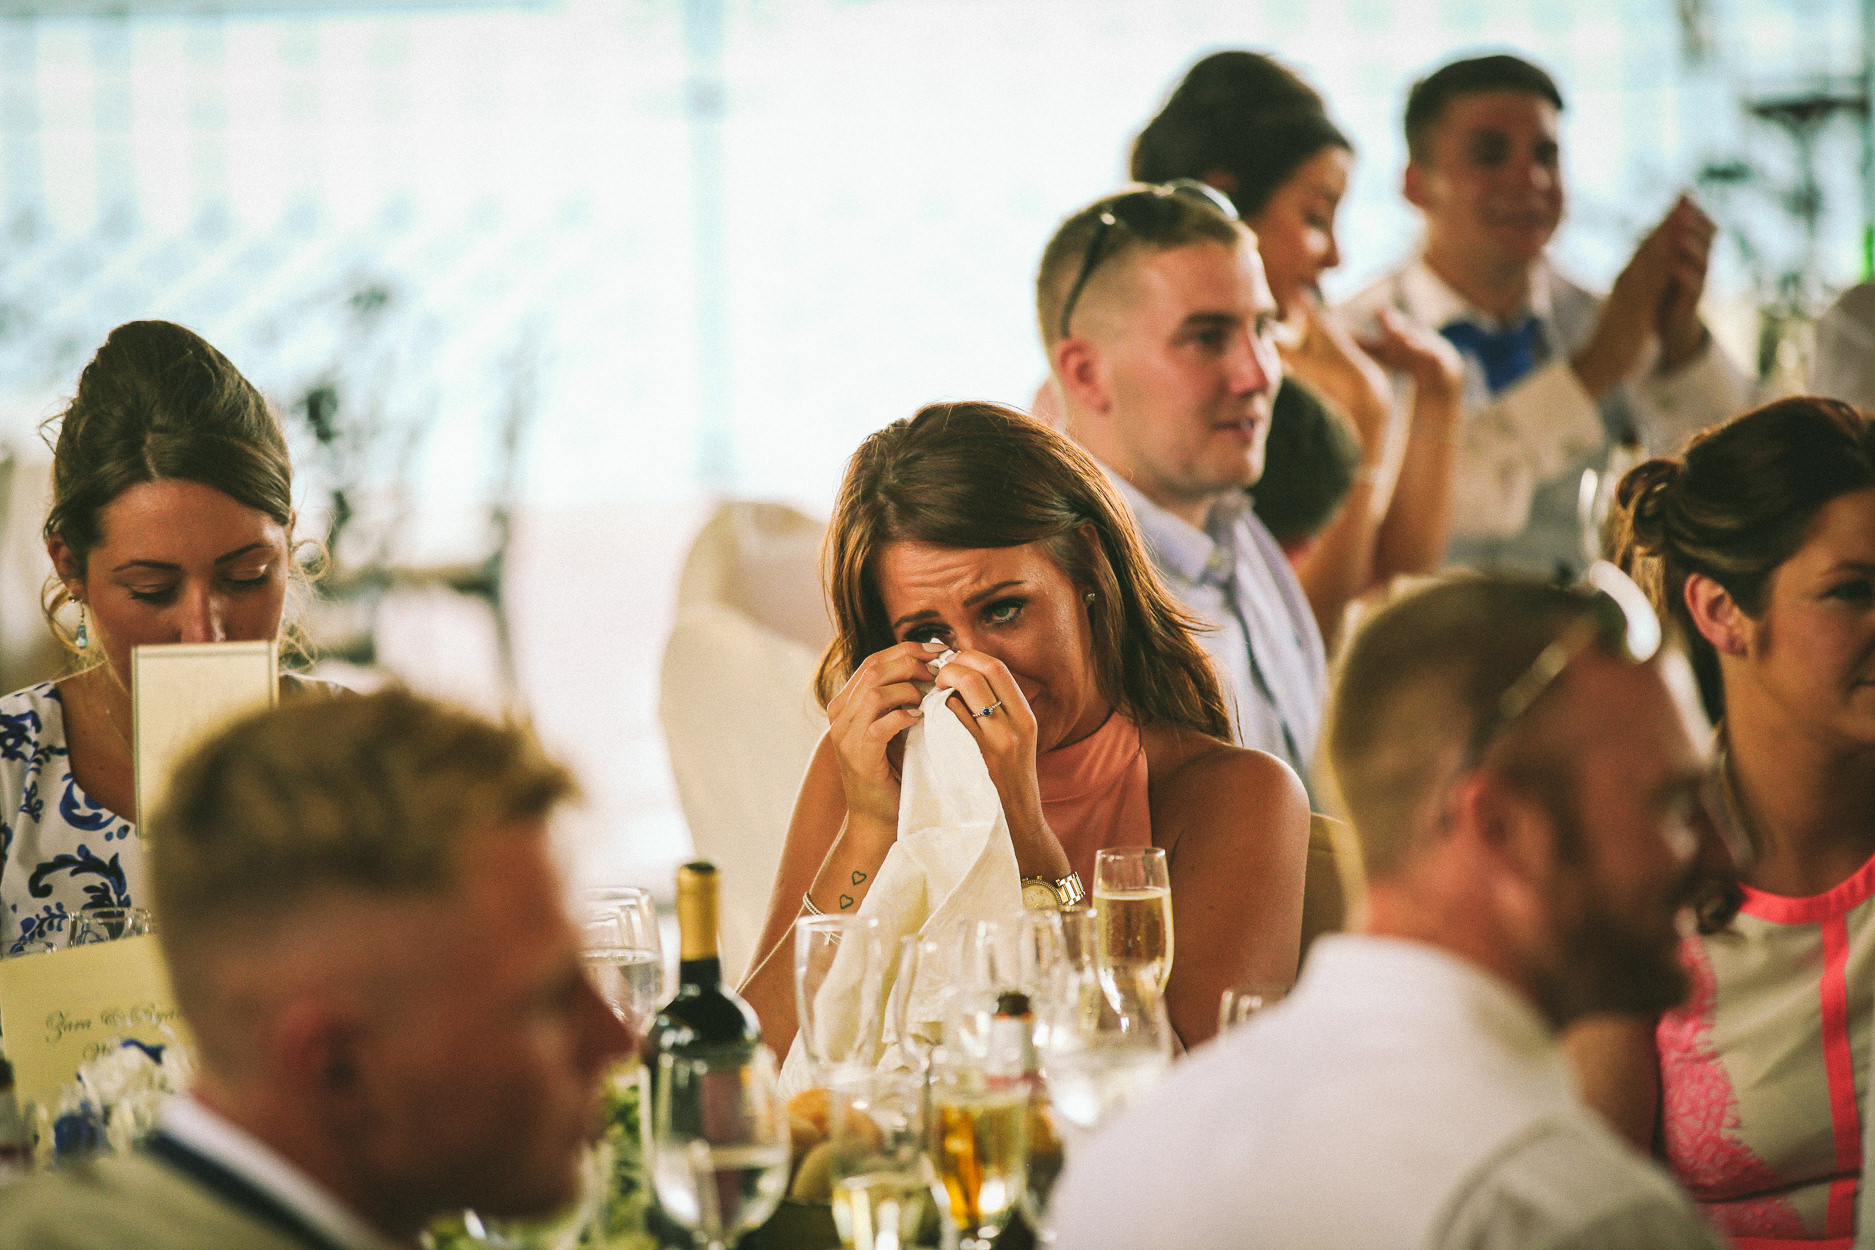 Amalfi-Coast-wedding-venue-Wedding-Photography-Villa Antiche Mura-Sorrento-Italy-10